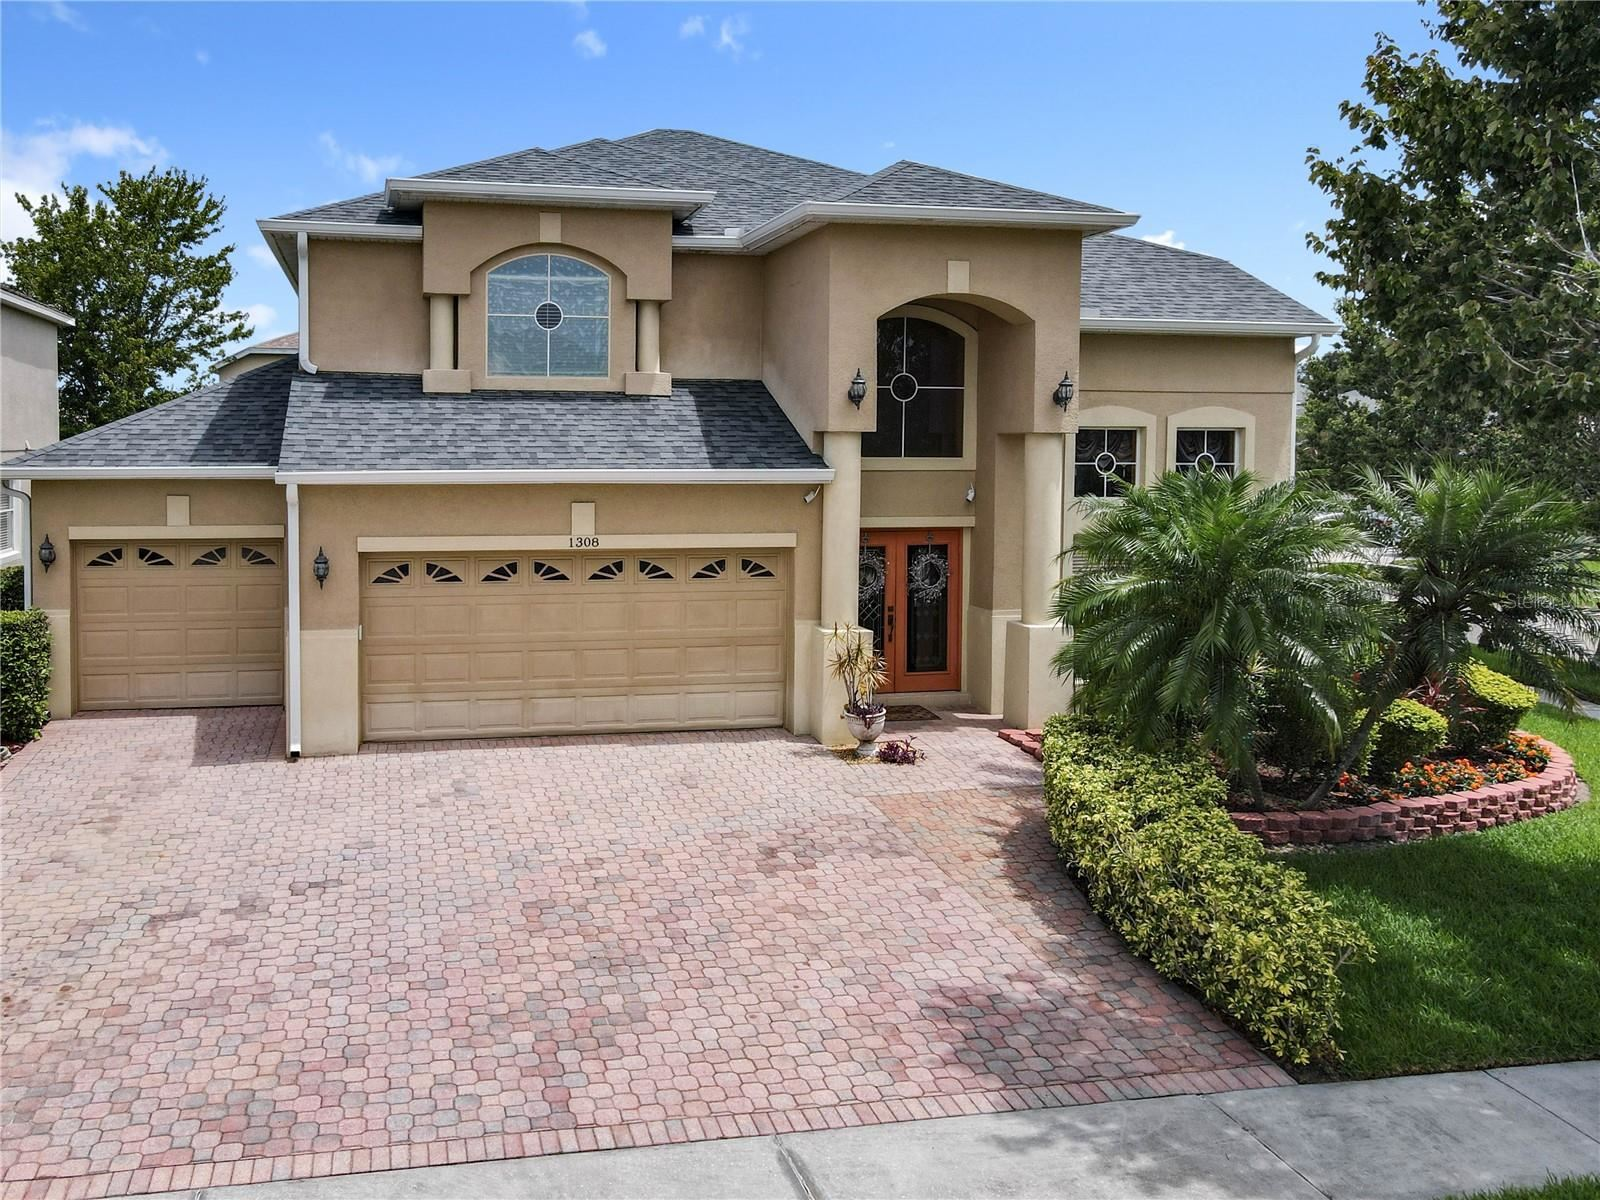 1308 AMARYLLIS CIRCLE, Orlando, FL 32825 - #: O5953757